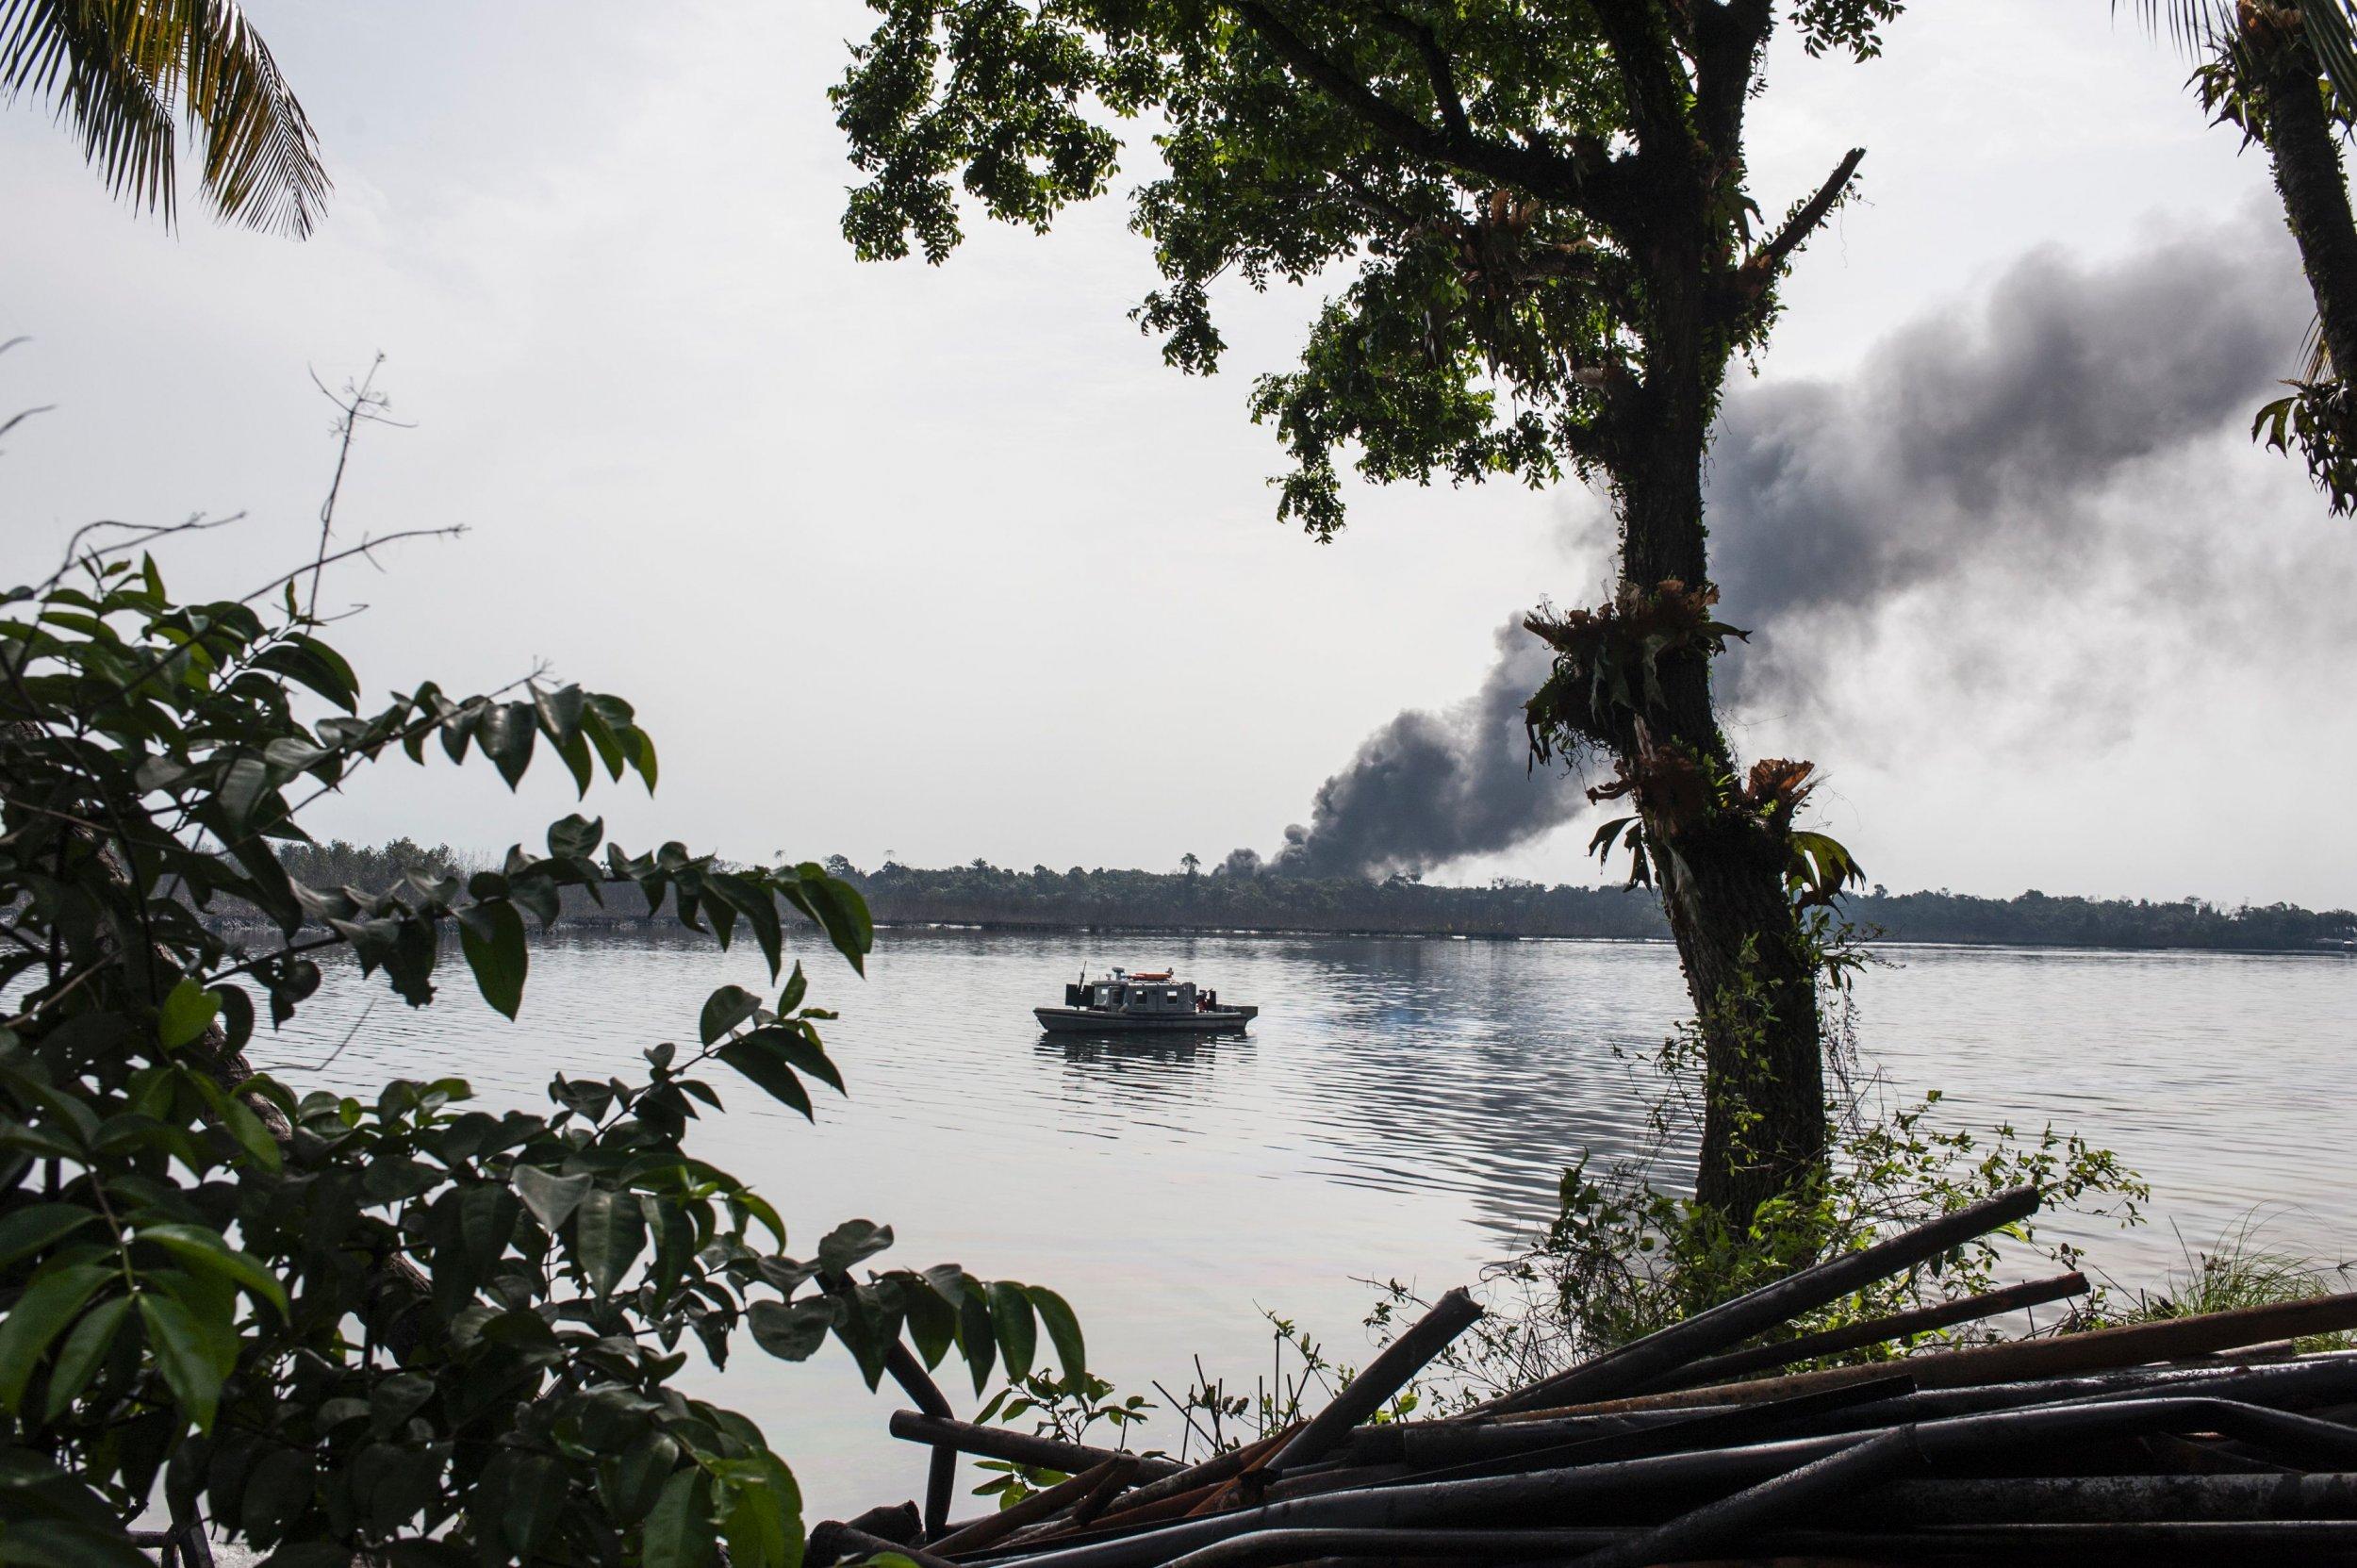 Niger Delta illegal refinery